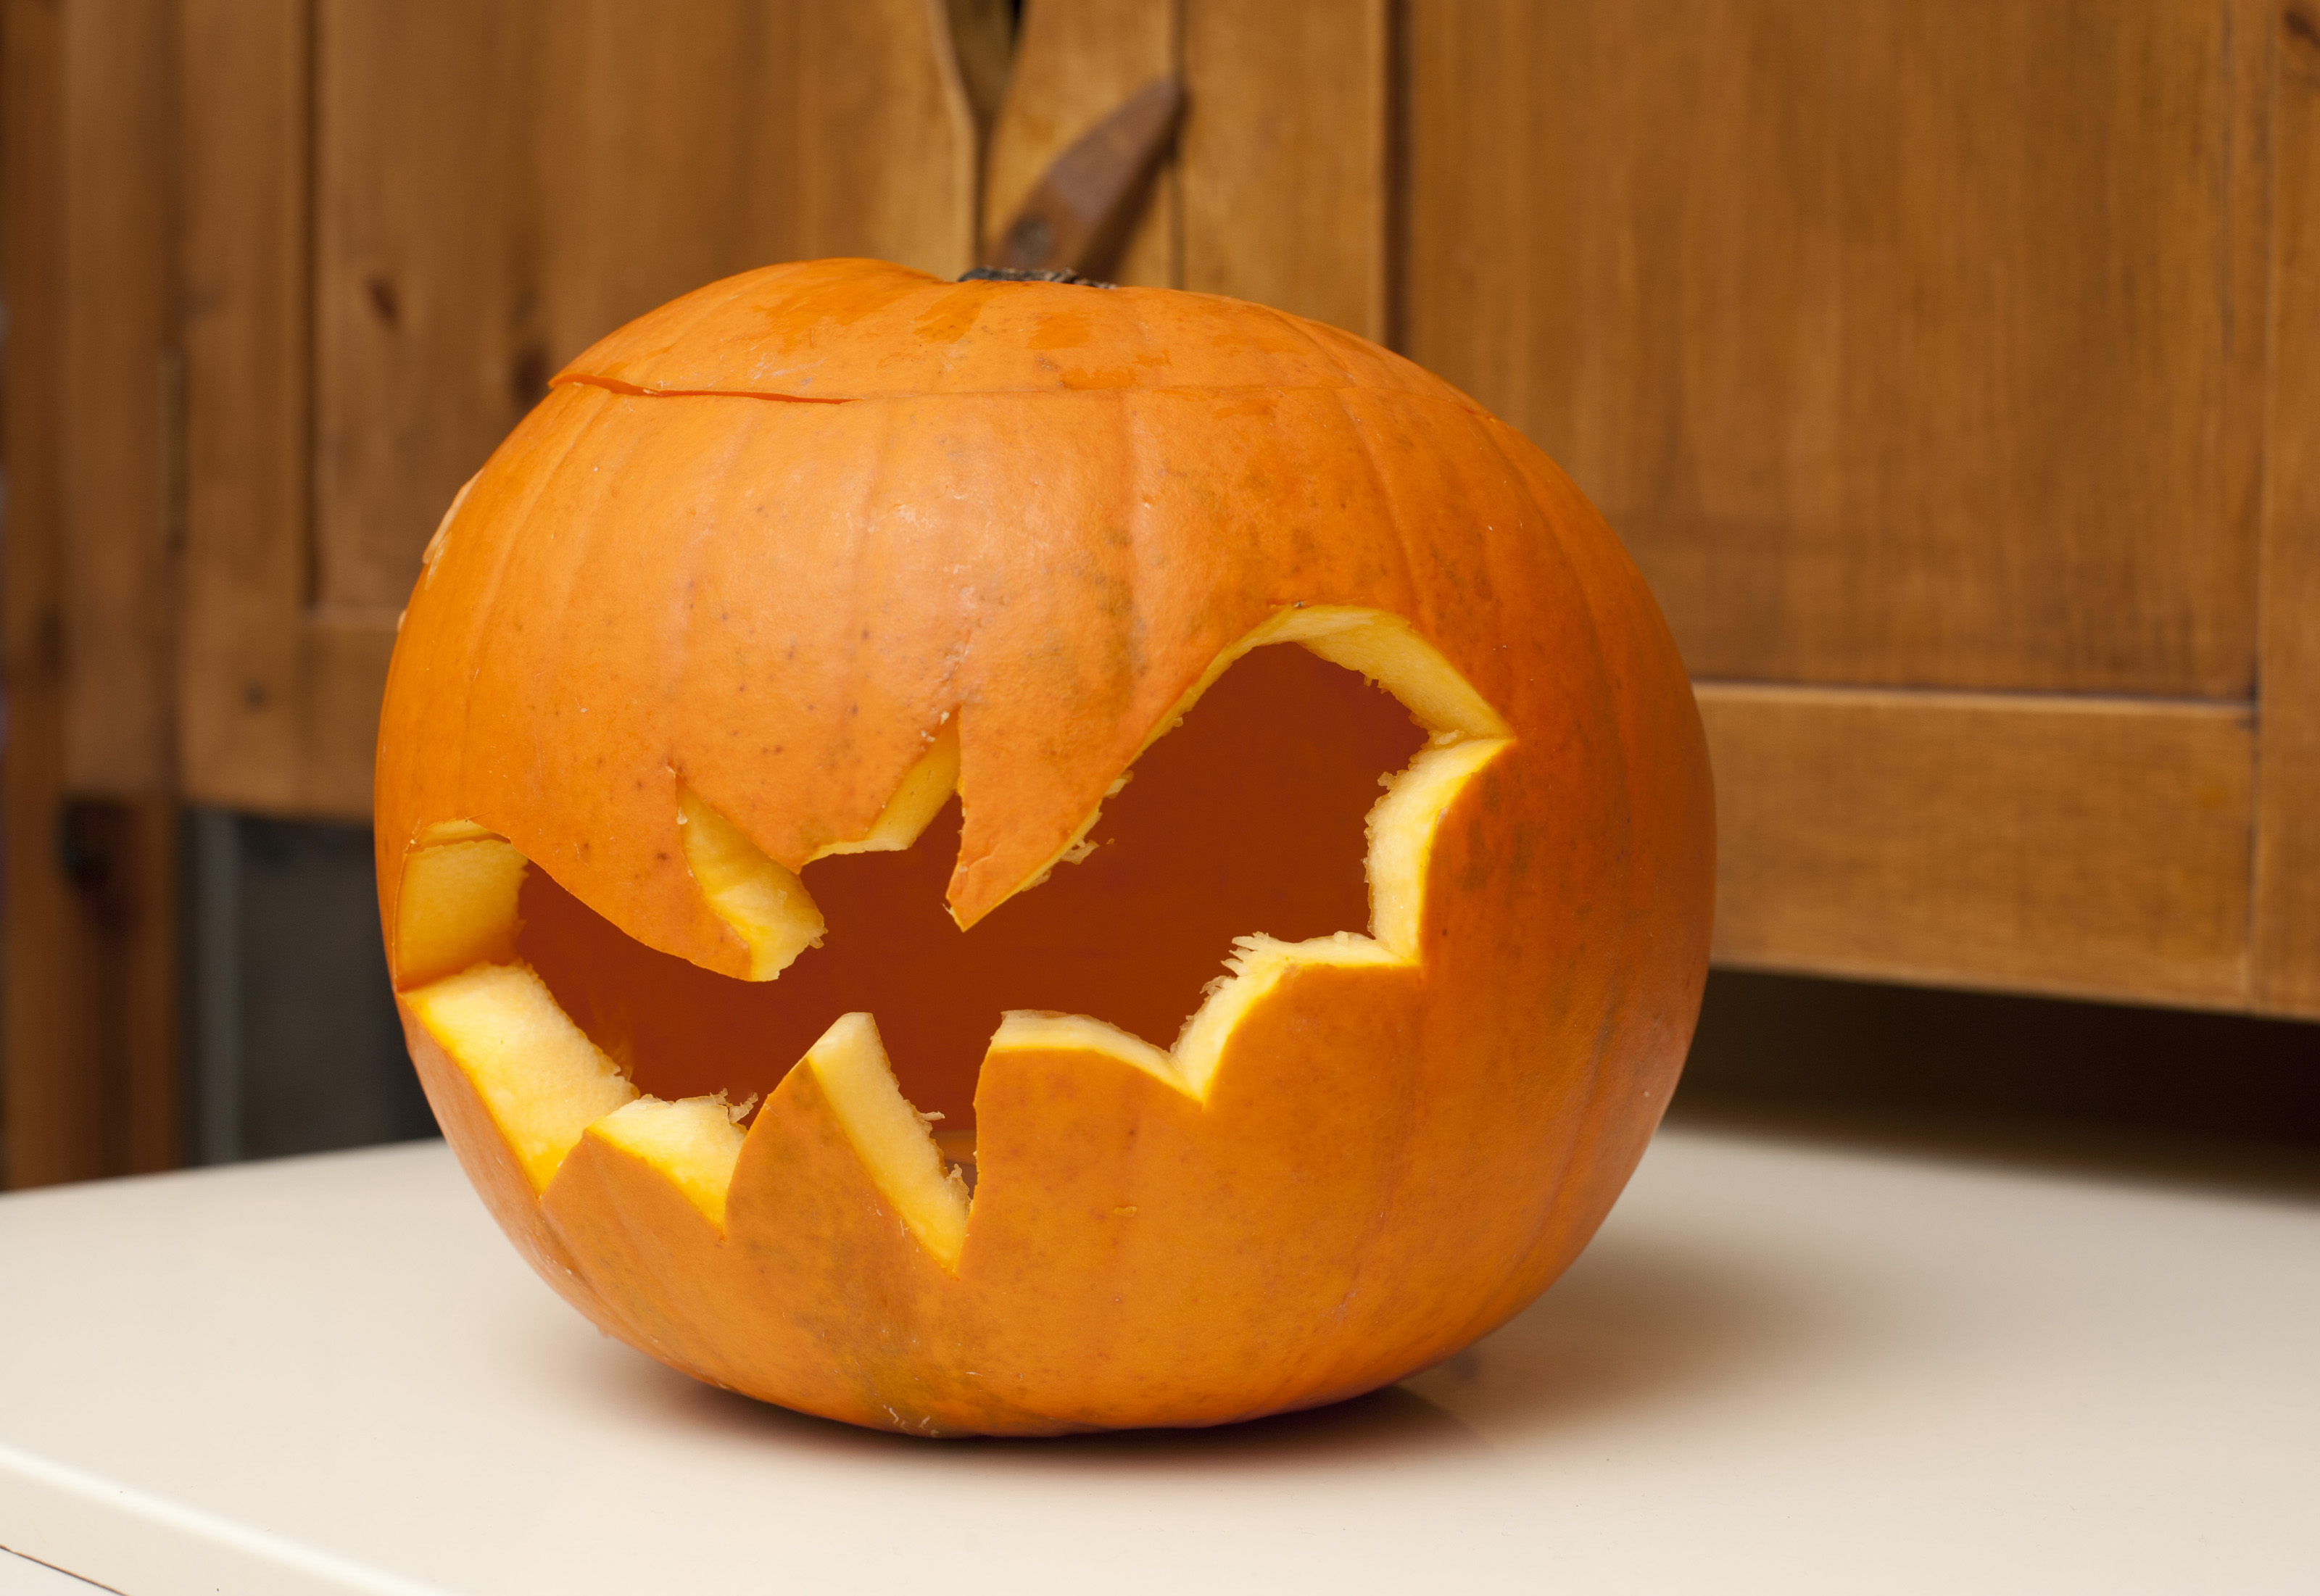 Image of Jack-o-lantern Halloween pumpkin with a bat ...